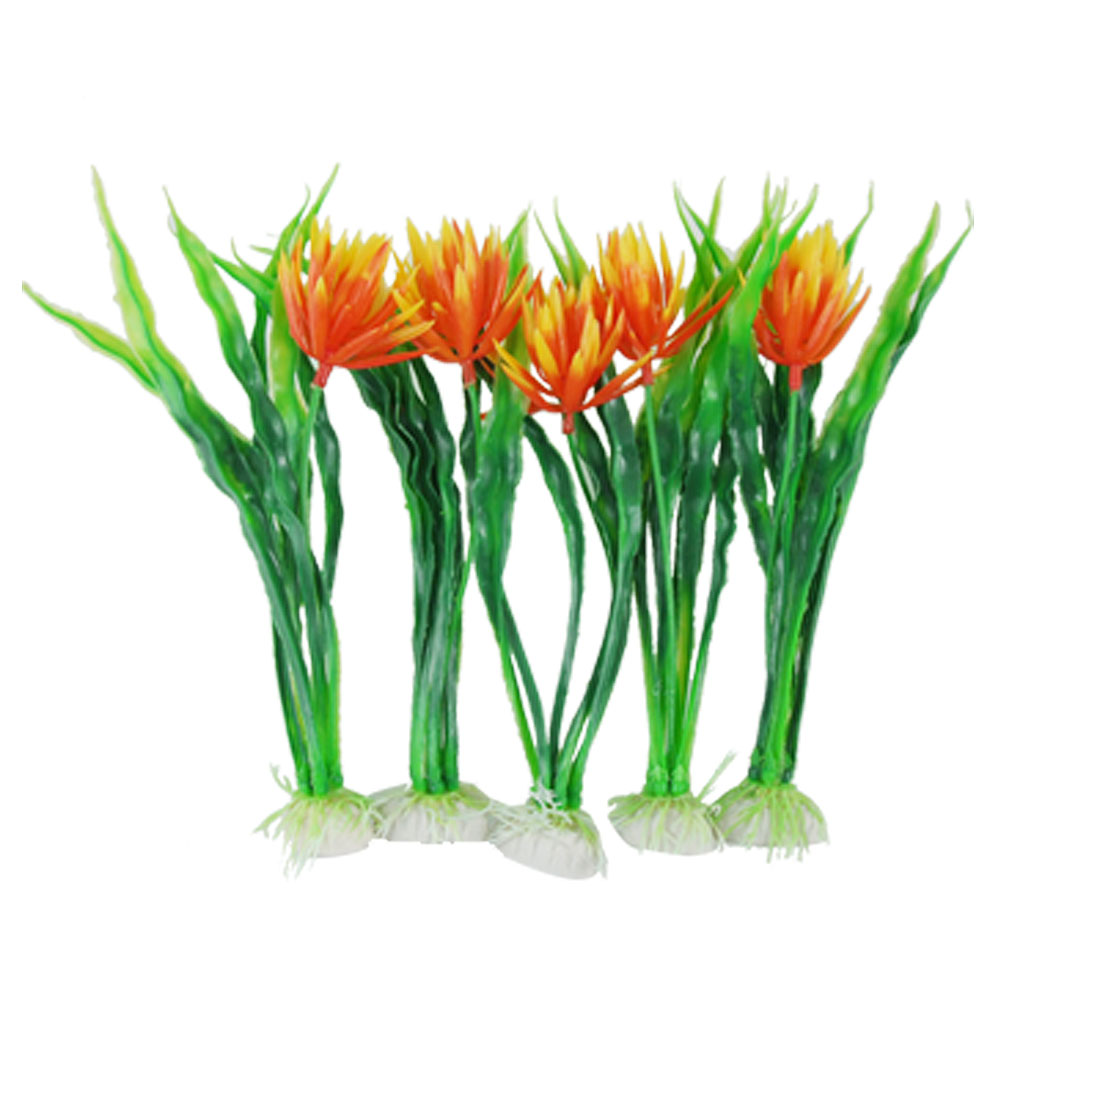 Fish Tank Plastic Bucephalandra Sp Orange Flower Decor